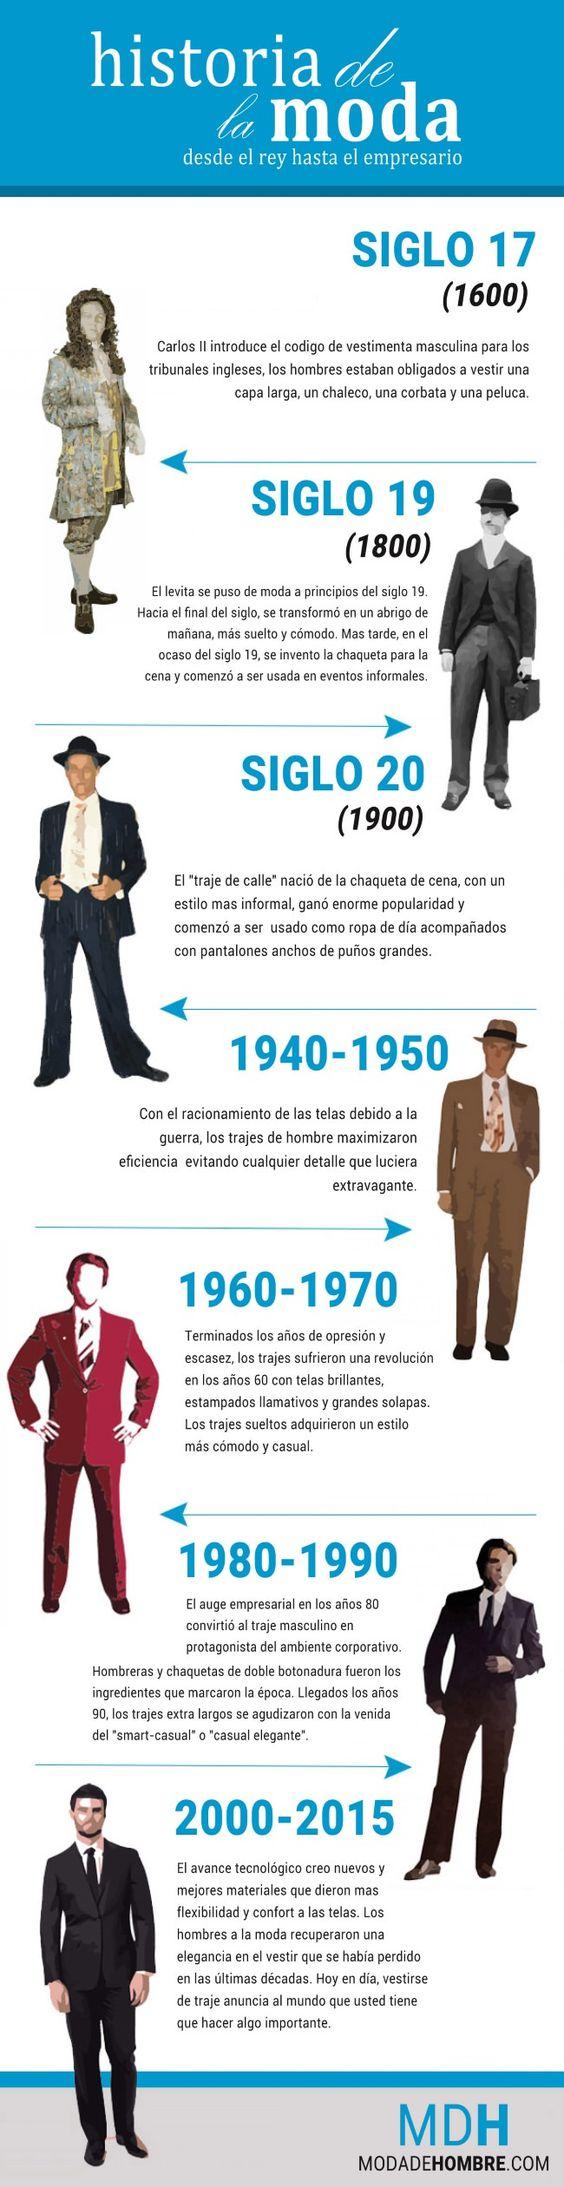 Historia nifty gay masculina